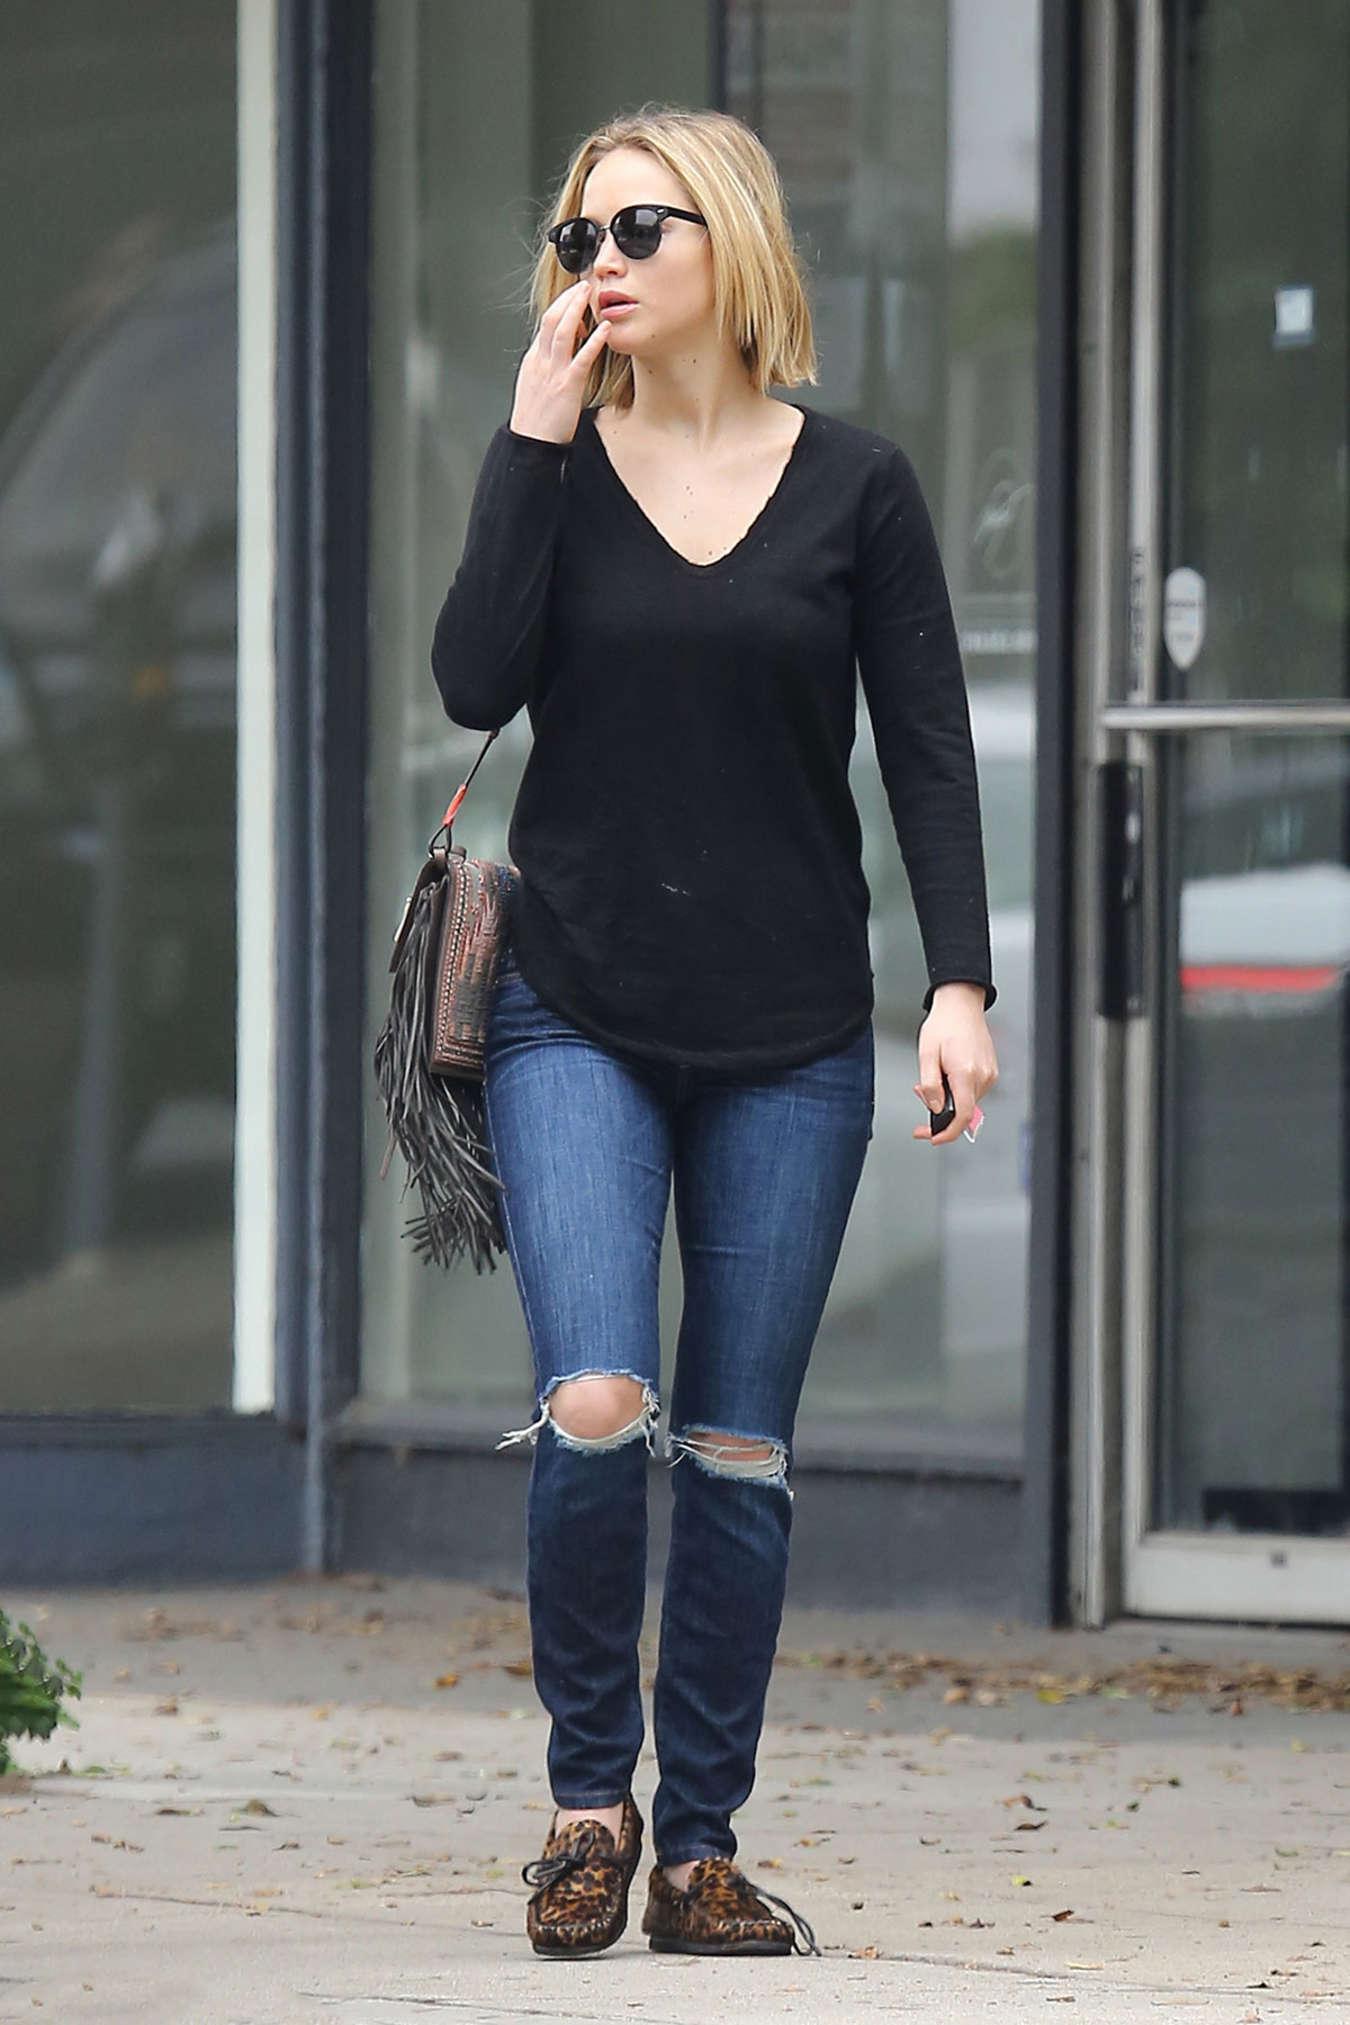 Jennifer Lawrence Booty in Jeans -01   GotCeleb